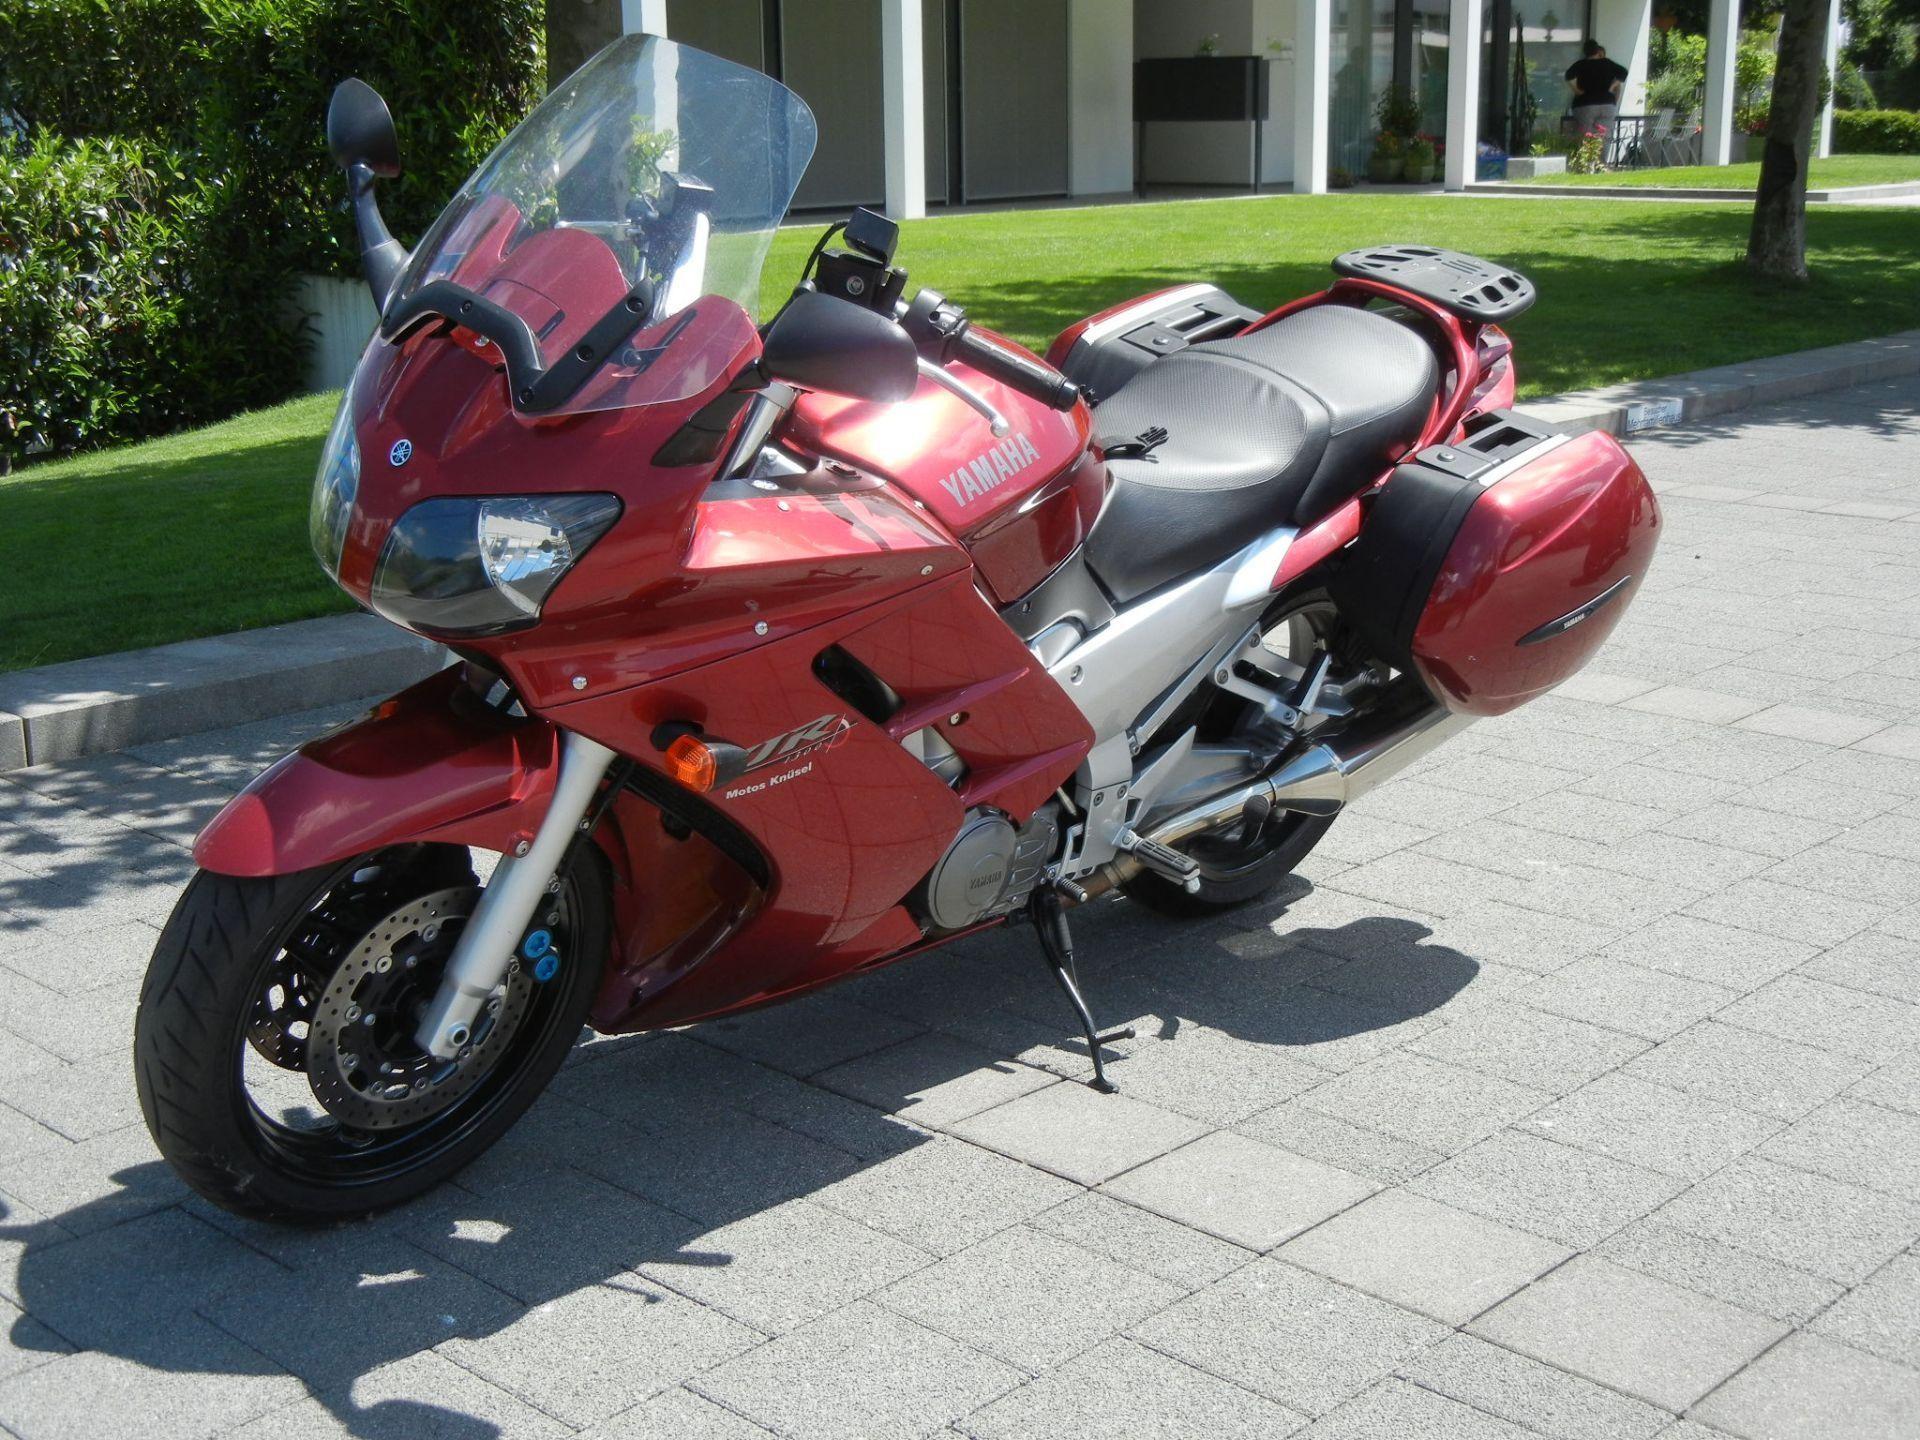 motorrad occasion kaufen yamaha fjr 1300 iff motorcycles ag gettnau. Black Bedroom Furniture Sets. Home Design Ideas